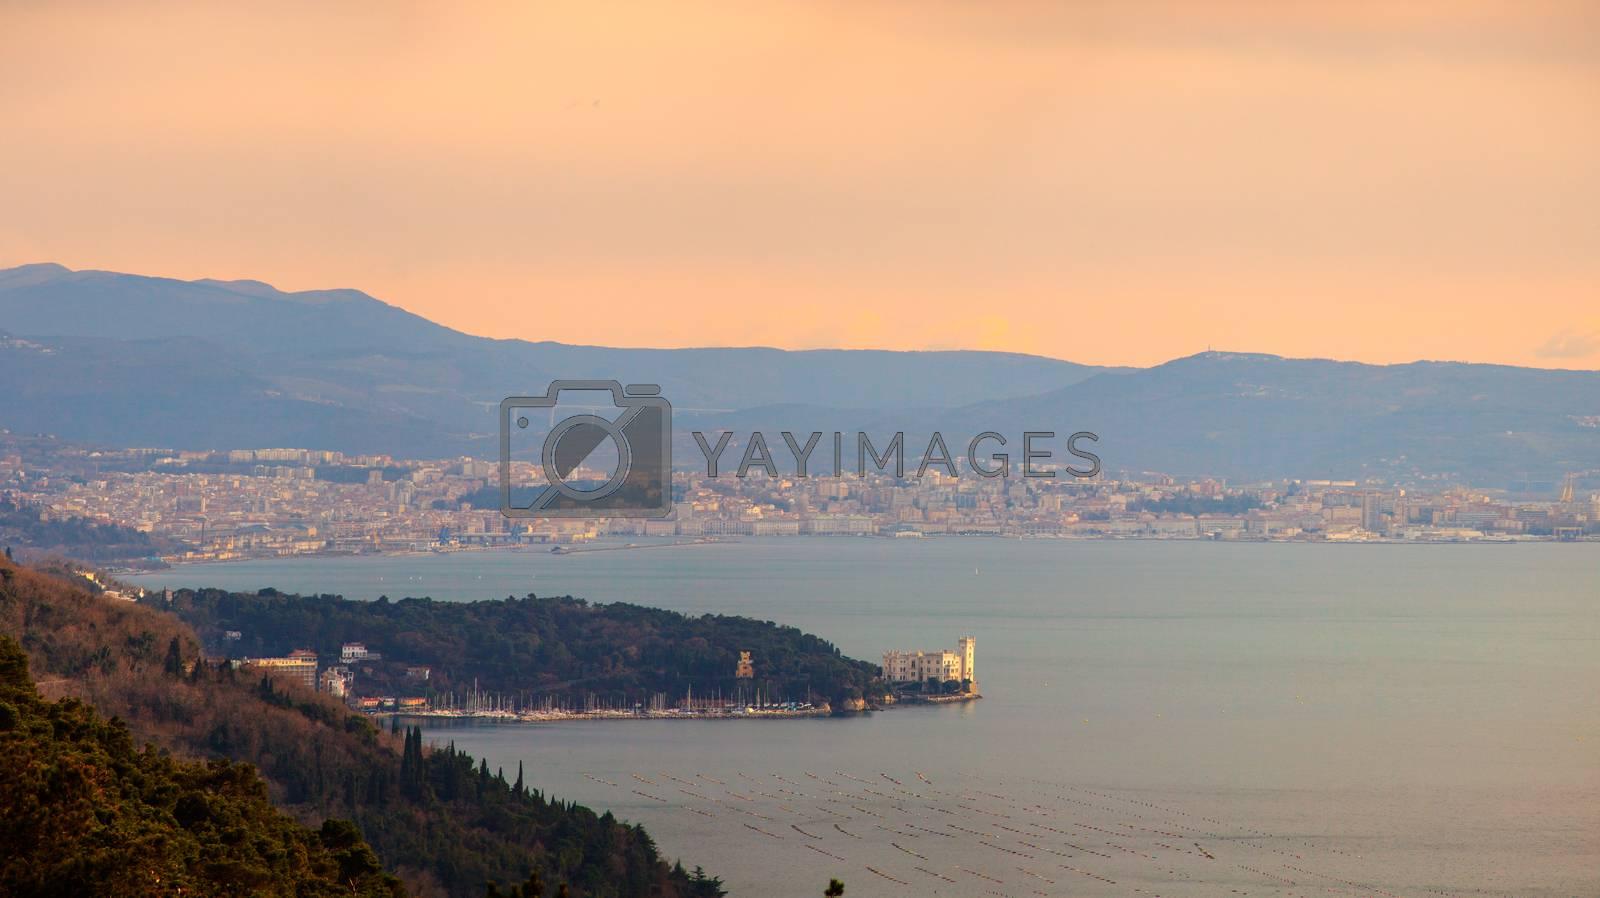 View of Miramare castle in the Trieste coast